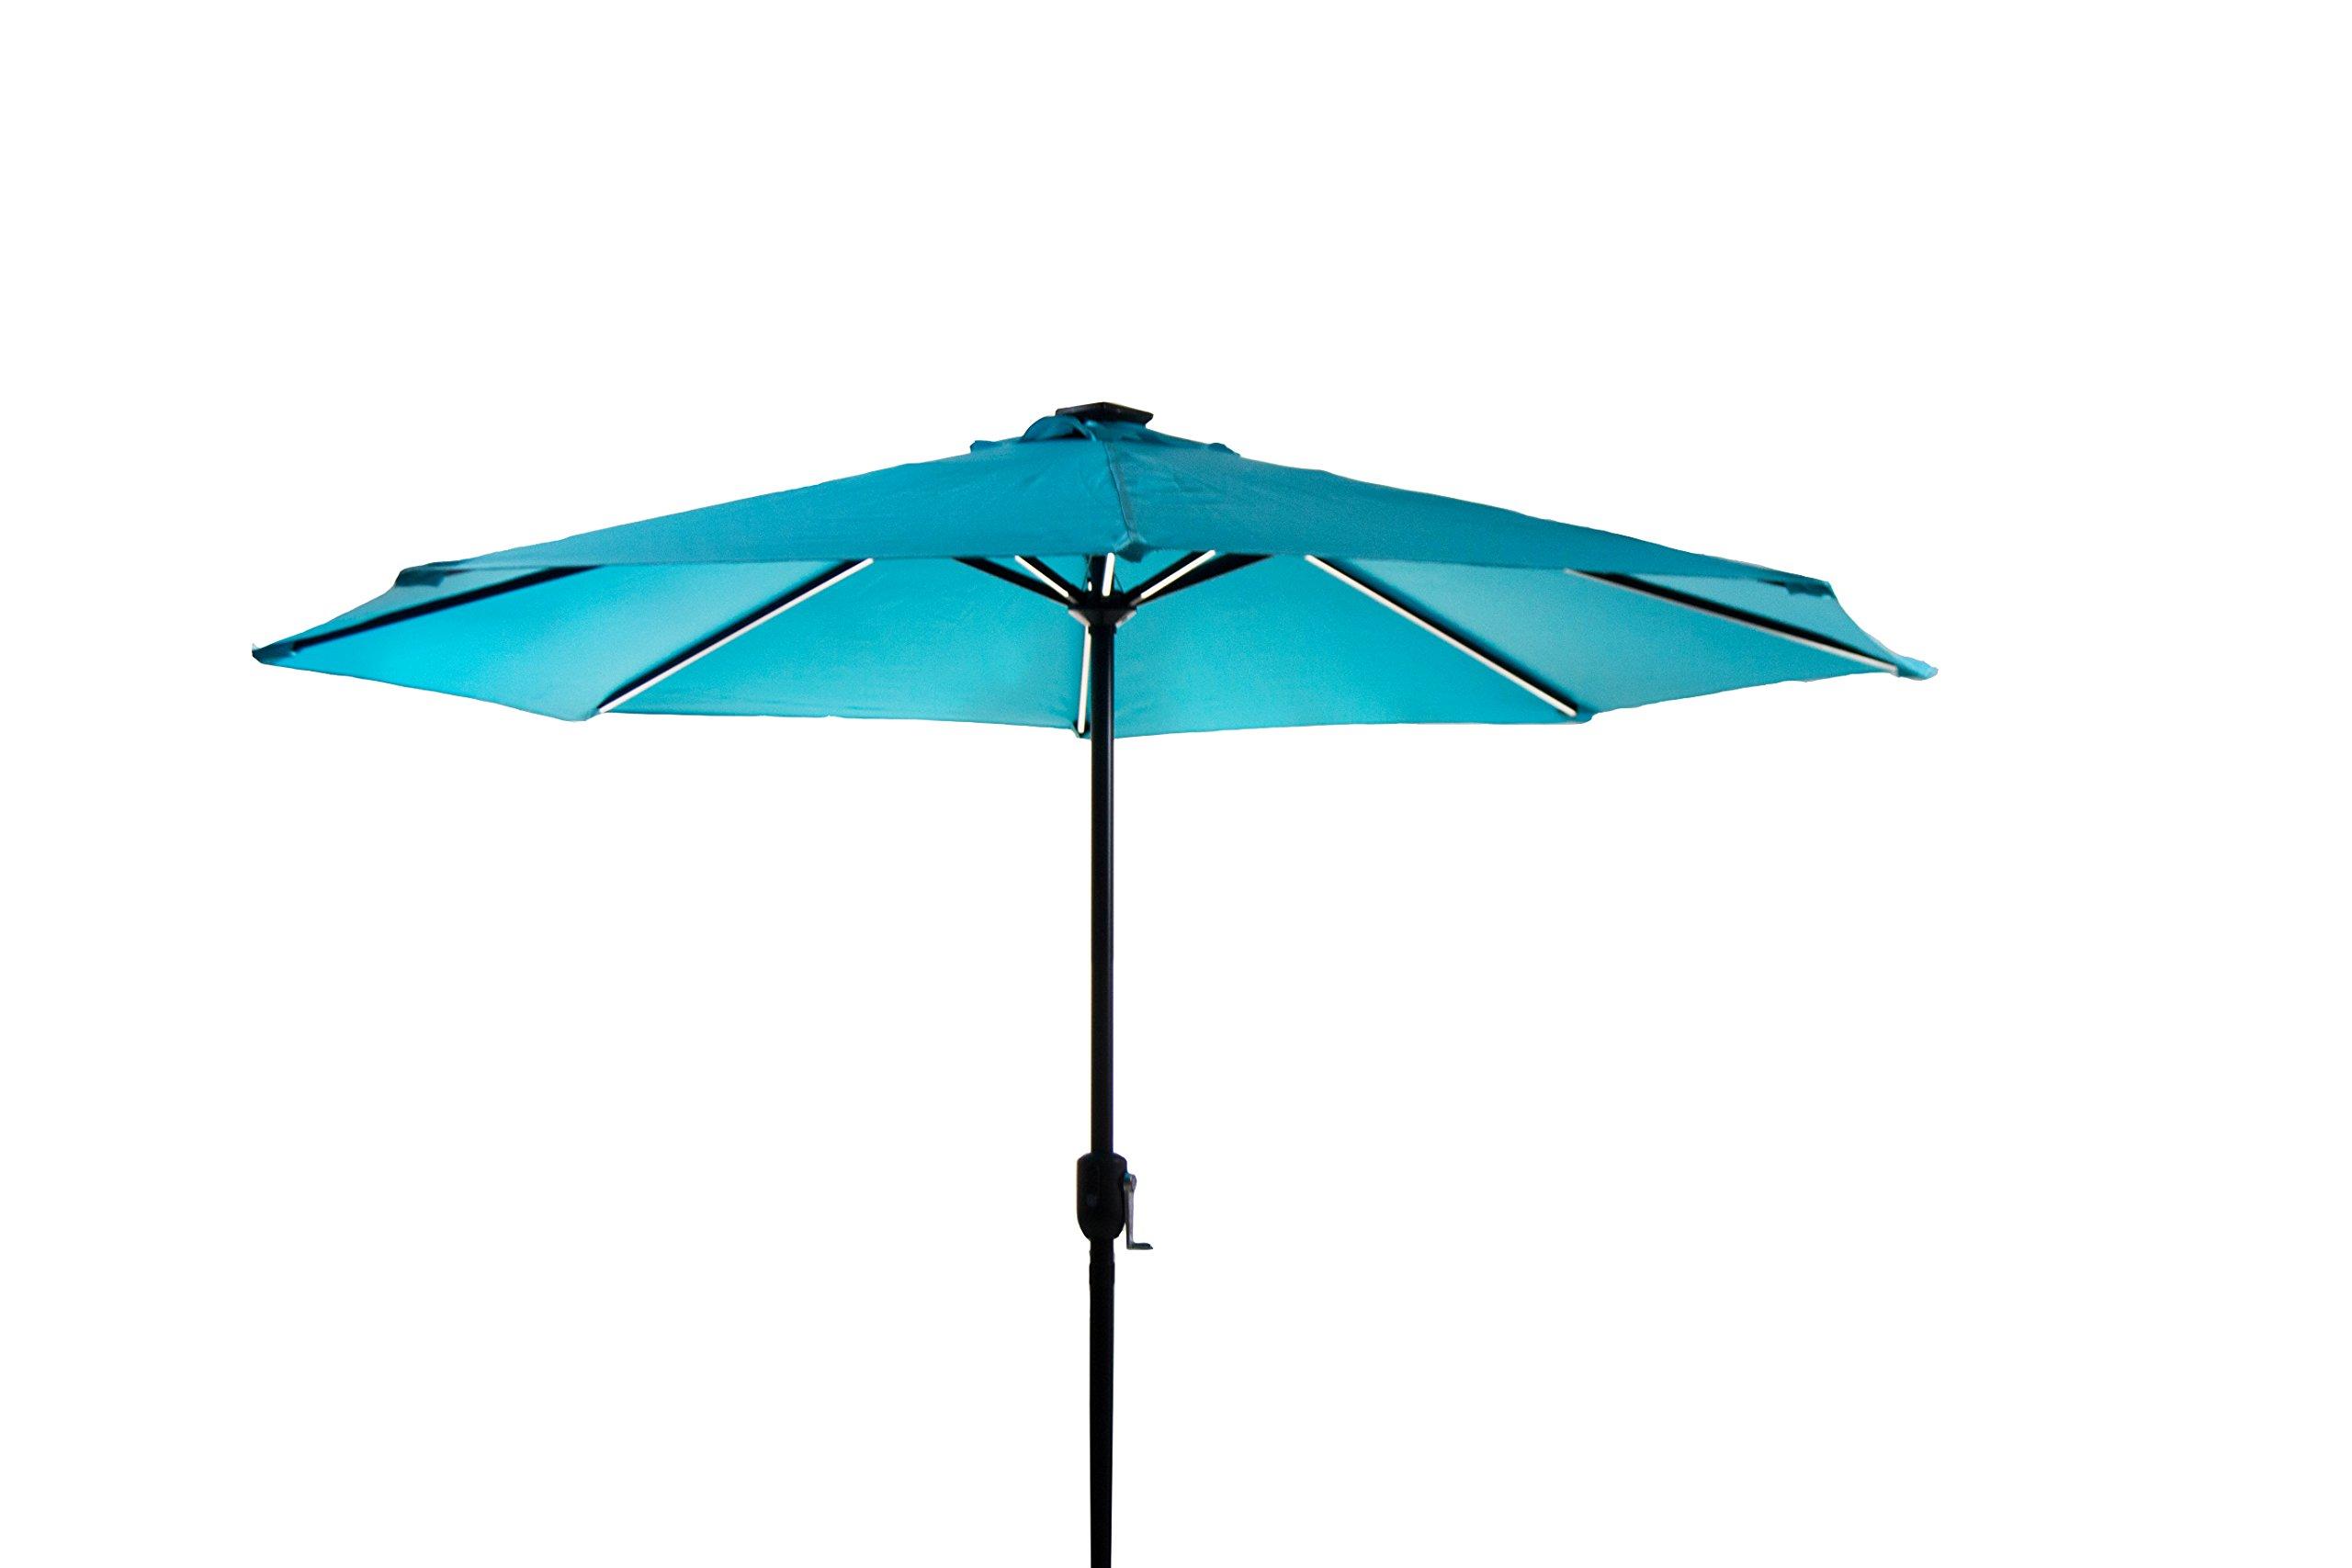 Polaris Garden Outdoor Patio 9 Ft Deluxe Aluminum Table Market Umbrella with Crank Handle, 8 Aluminium Ribs, Polyester Canopy, Solar Powered LED Lighted (Sky Blue)